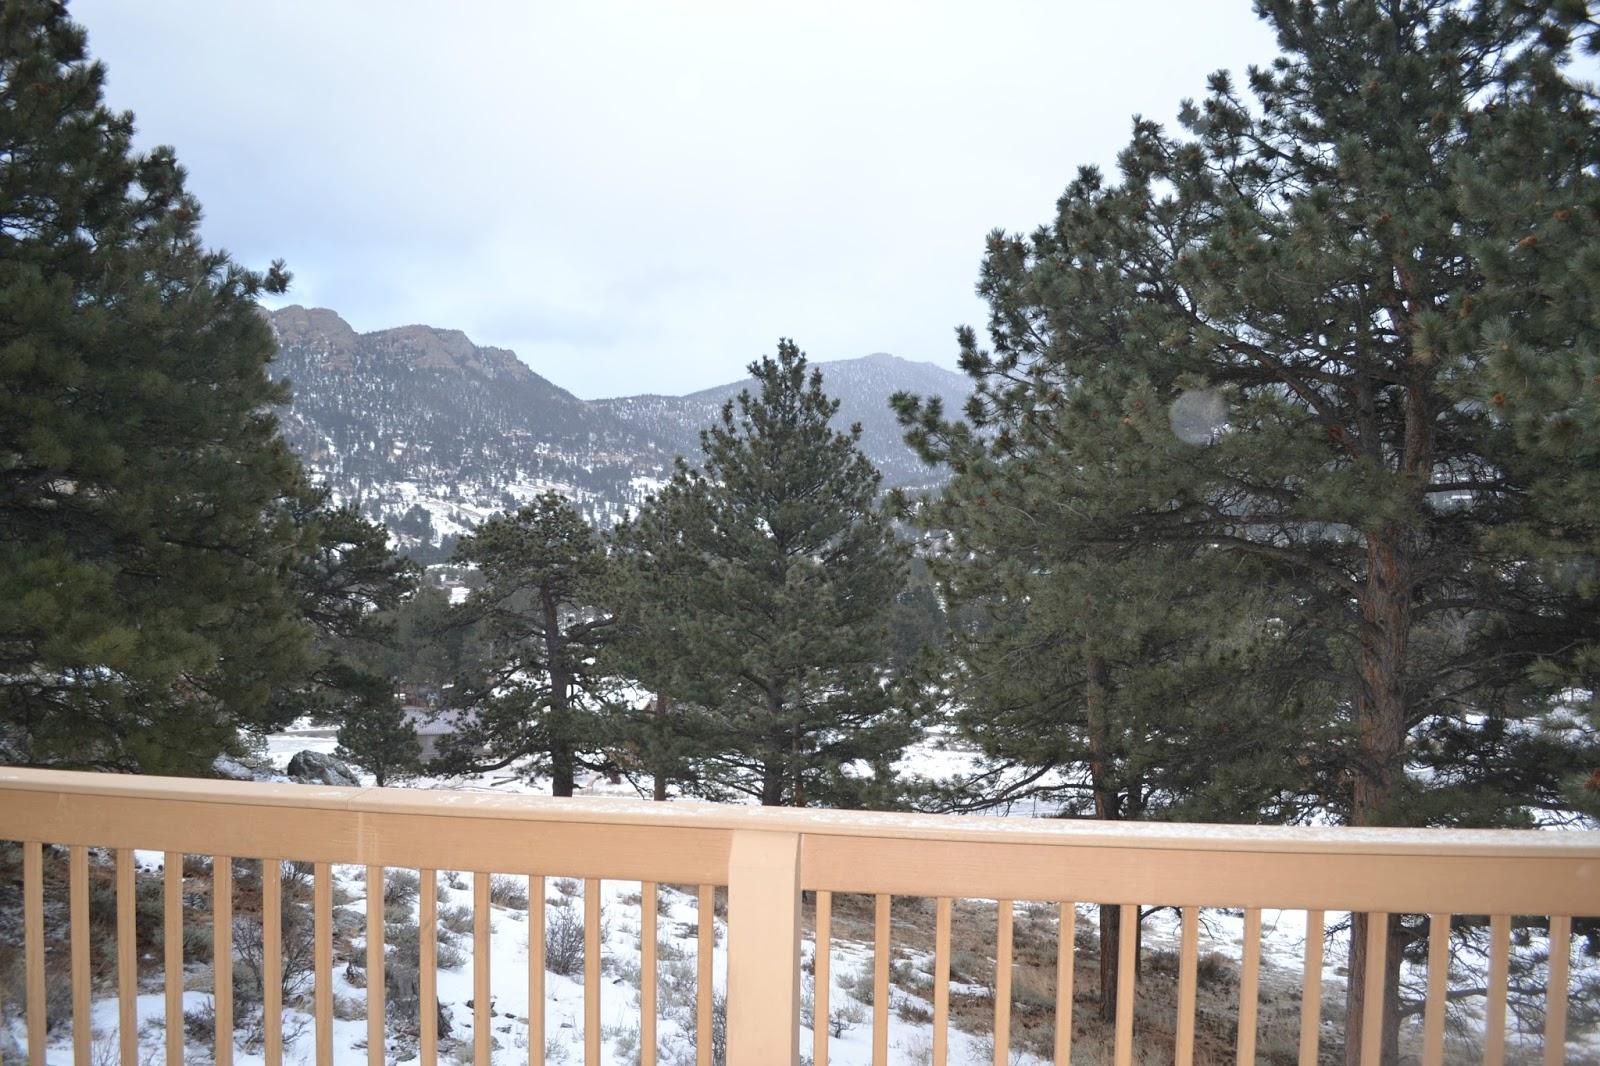 Ymca of the rockies estes park colorado building our story for Estes park lodging cabins